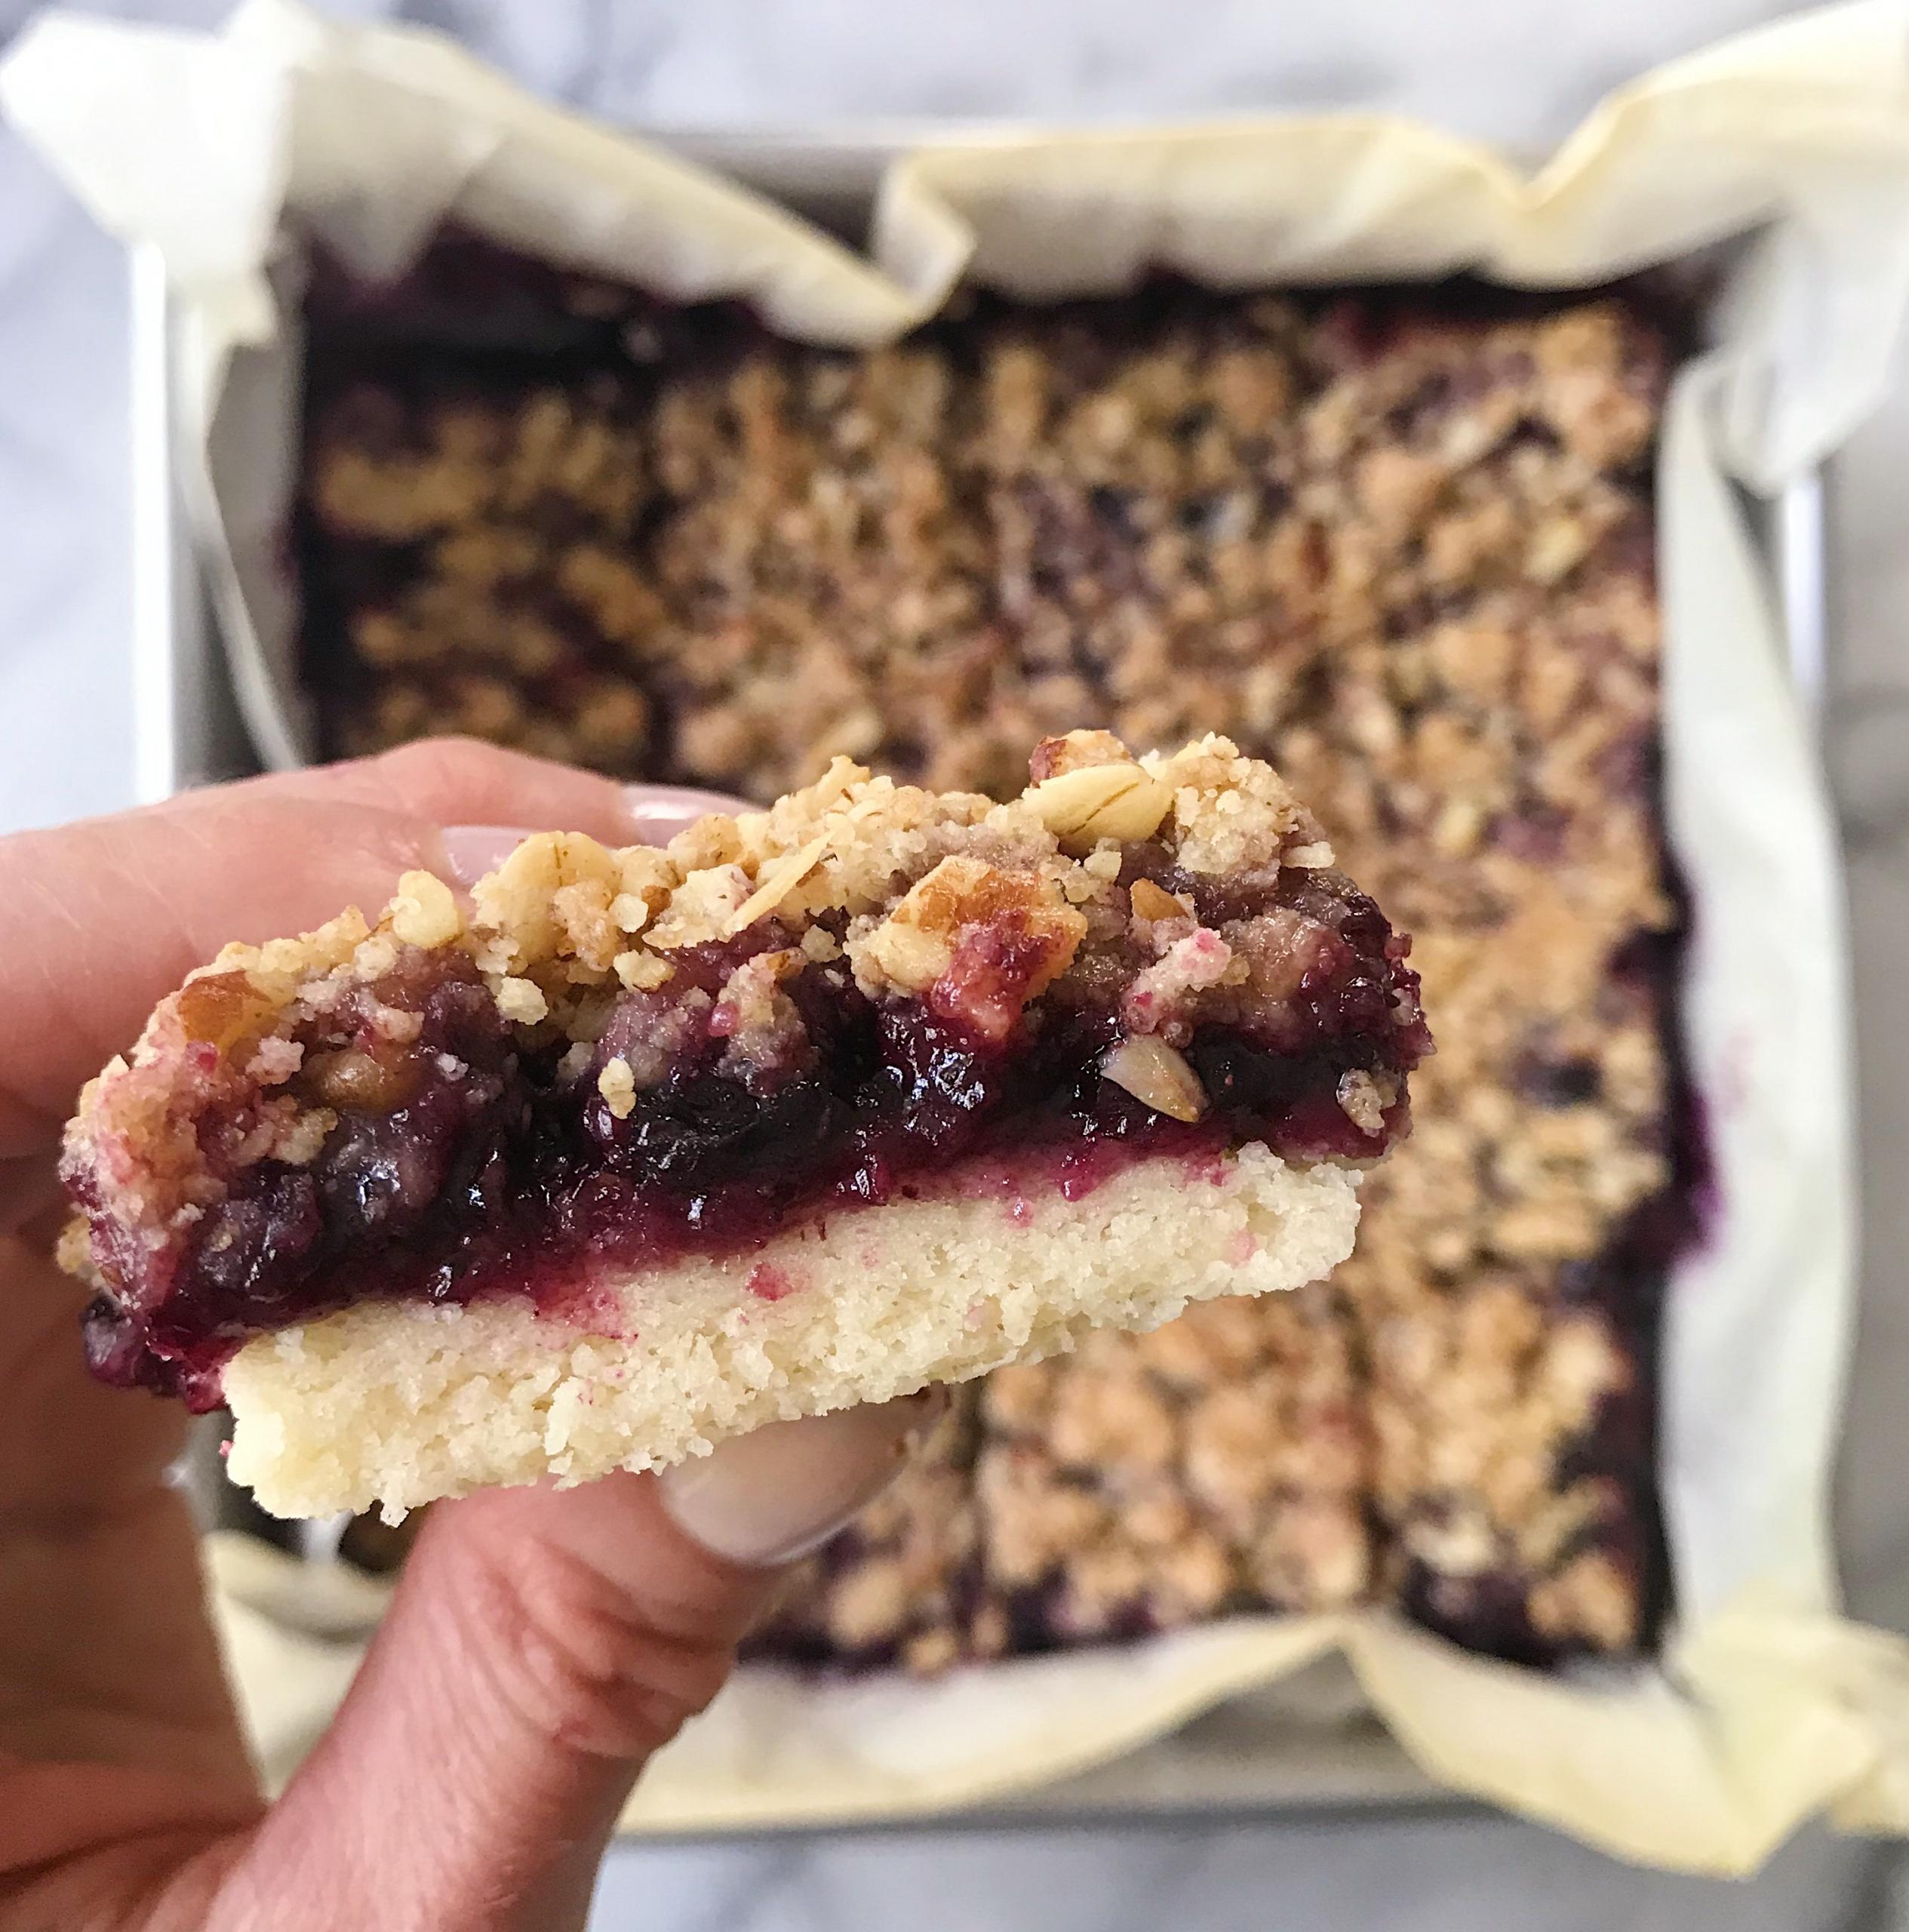 Blueberry Crumble Bars gluten free #glutenfreerecipes www.healthygffamily.com